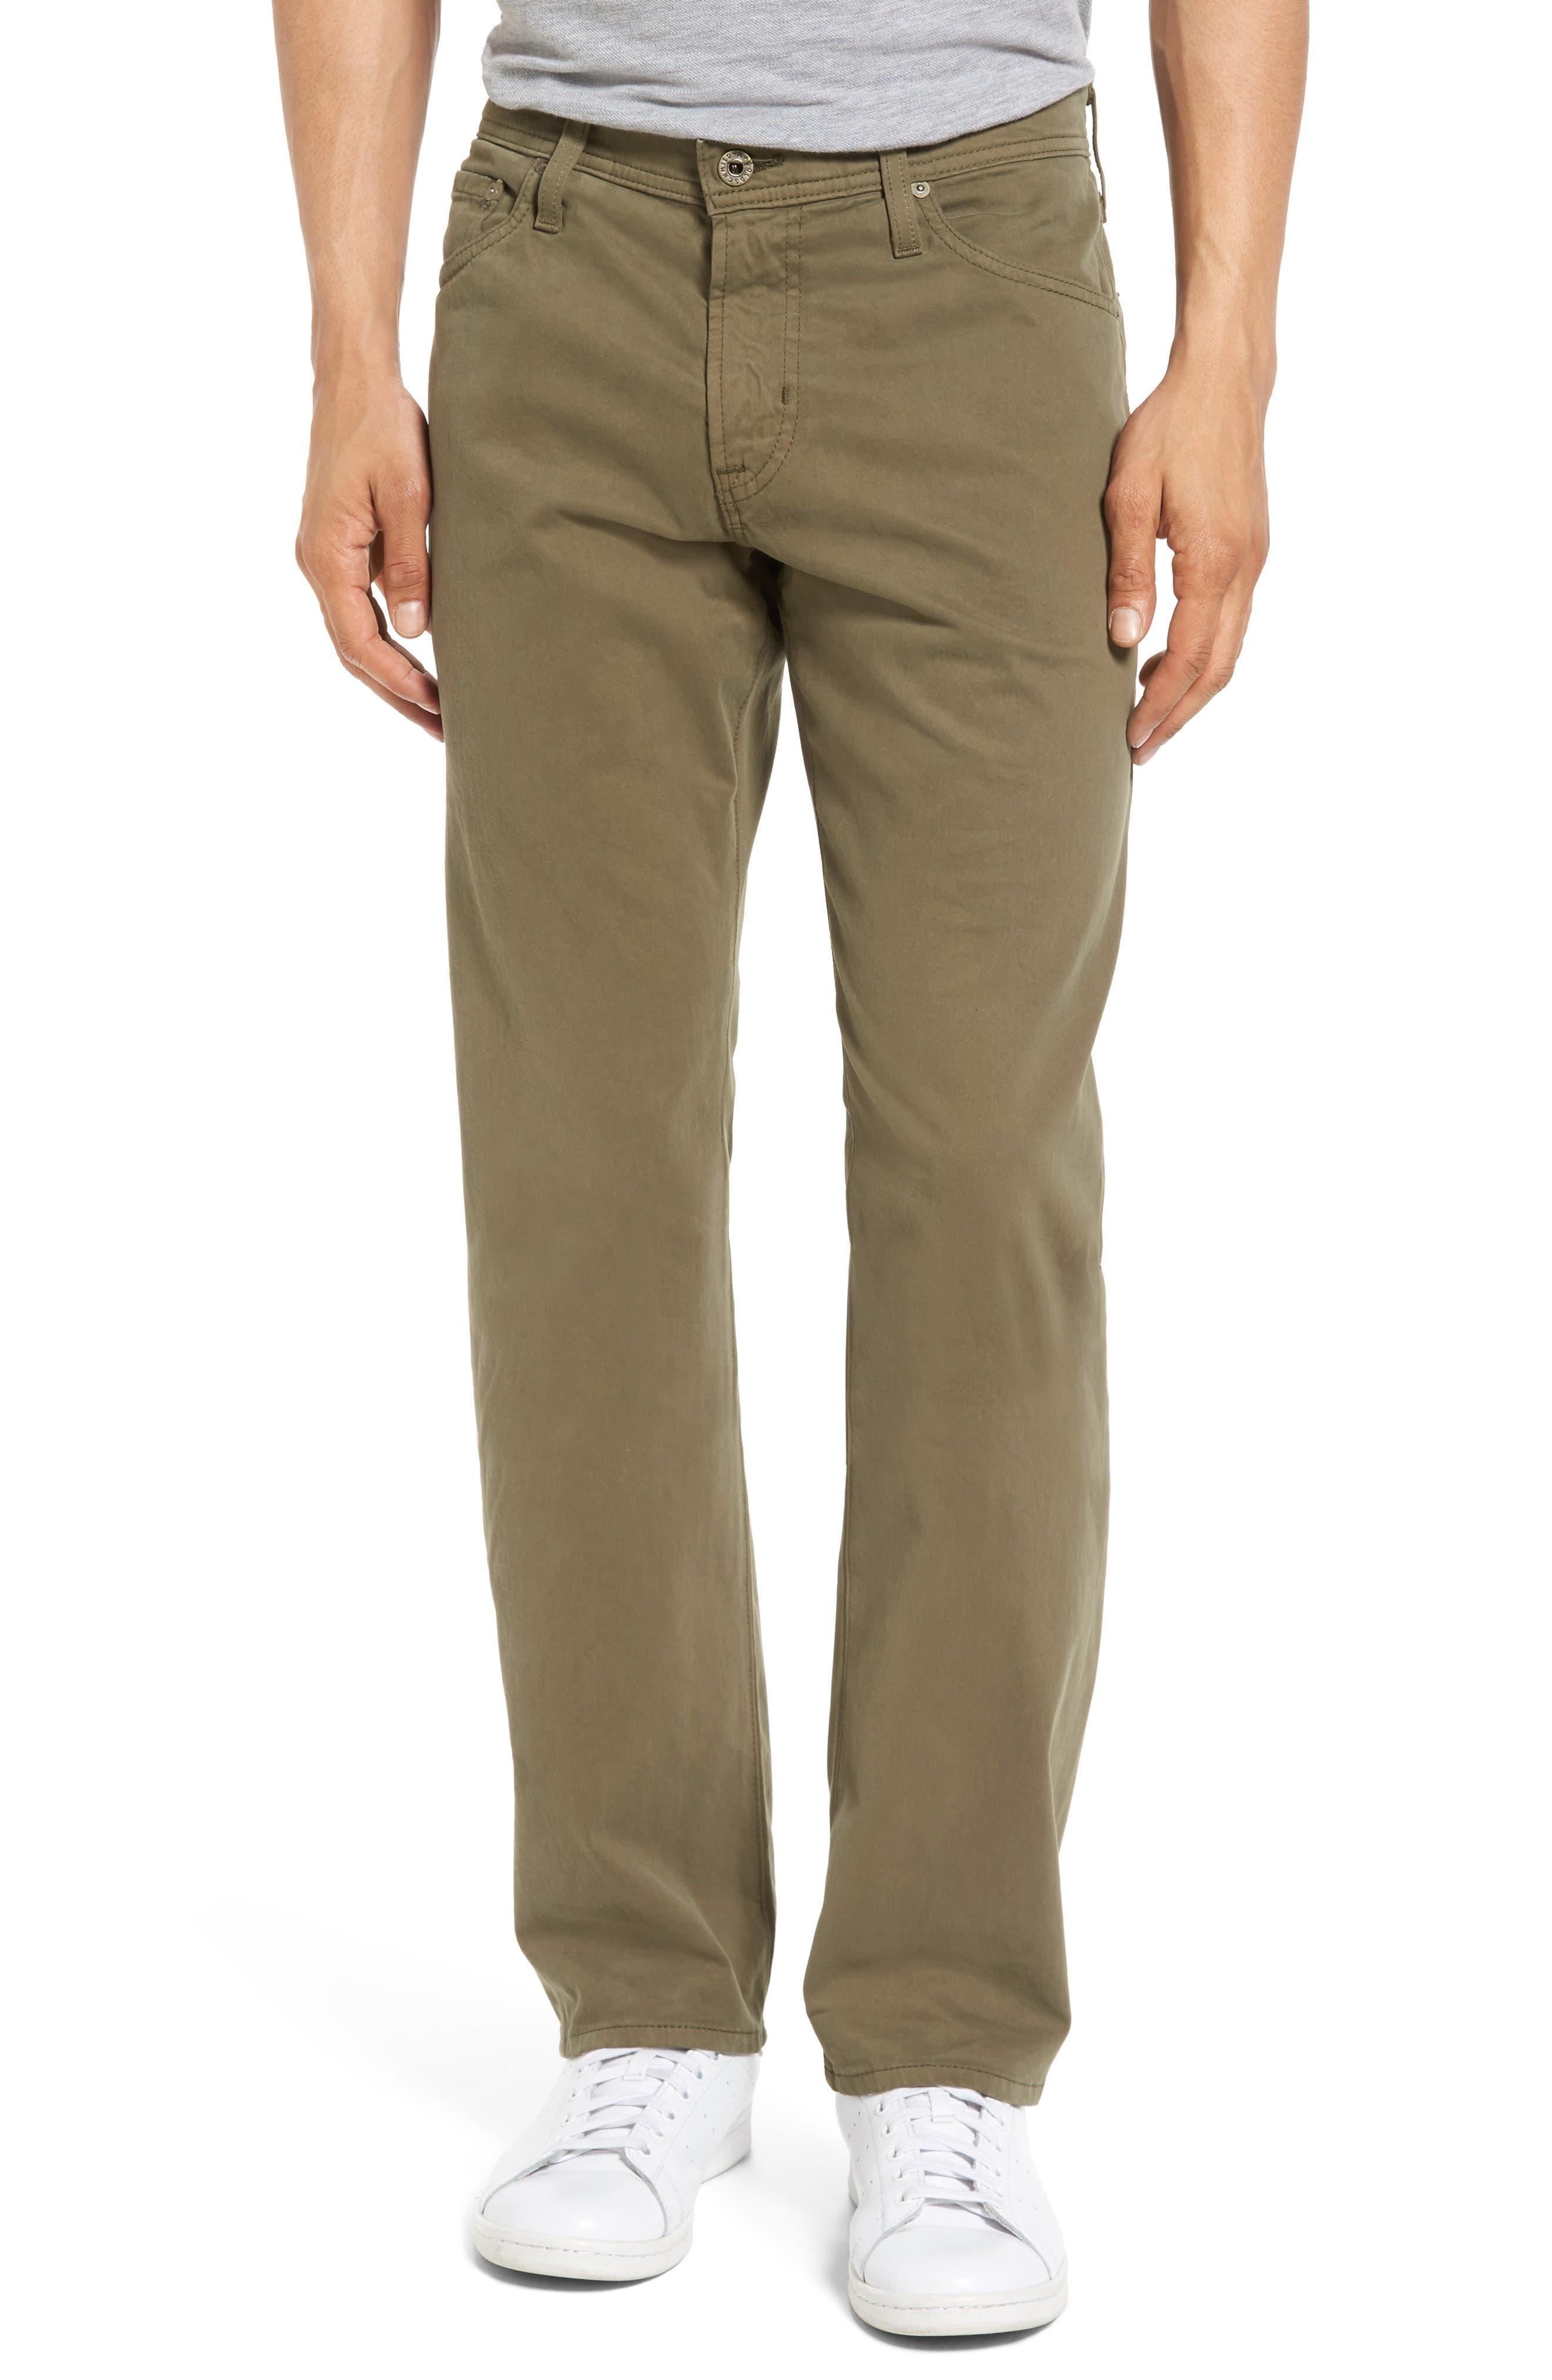 Graduate SUD Slim Straight Leg Pants,                         Main,                         color, Caper Leaf